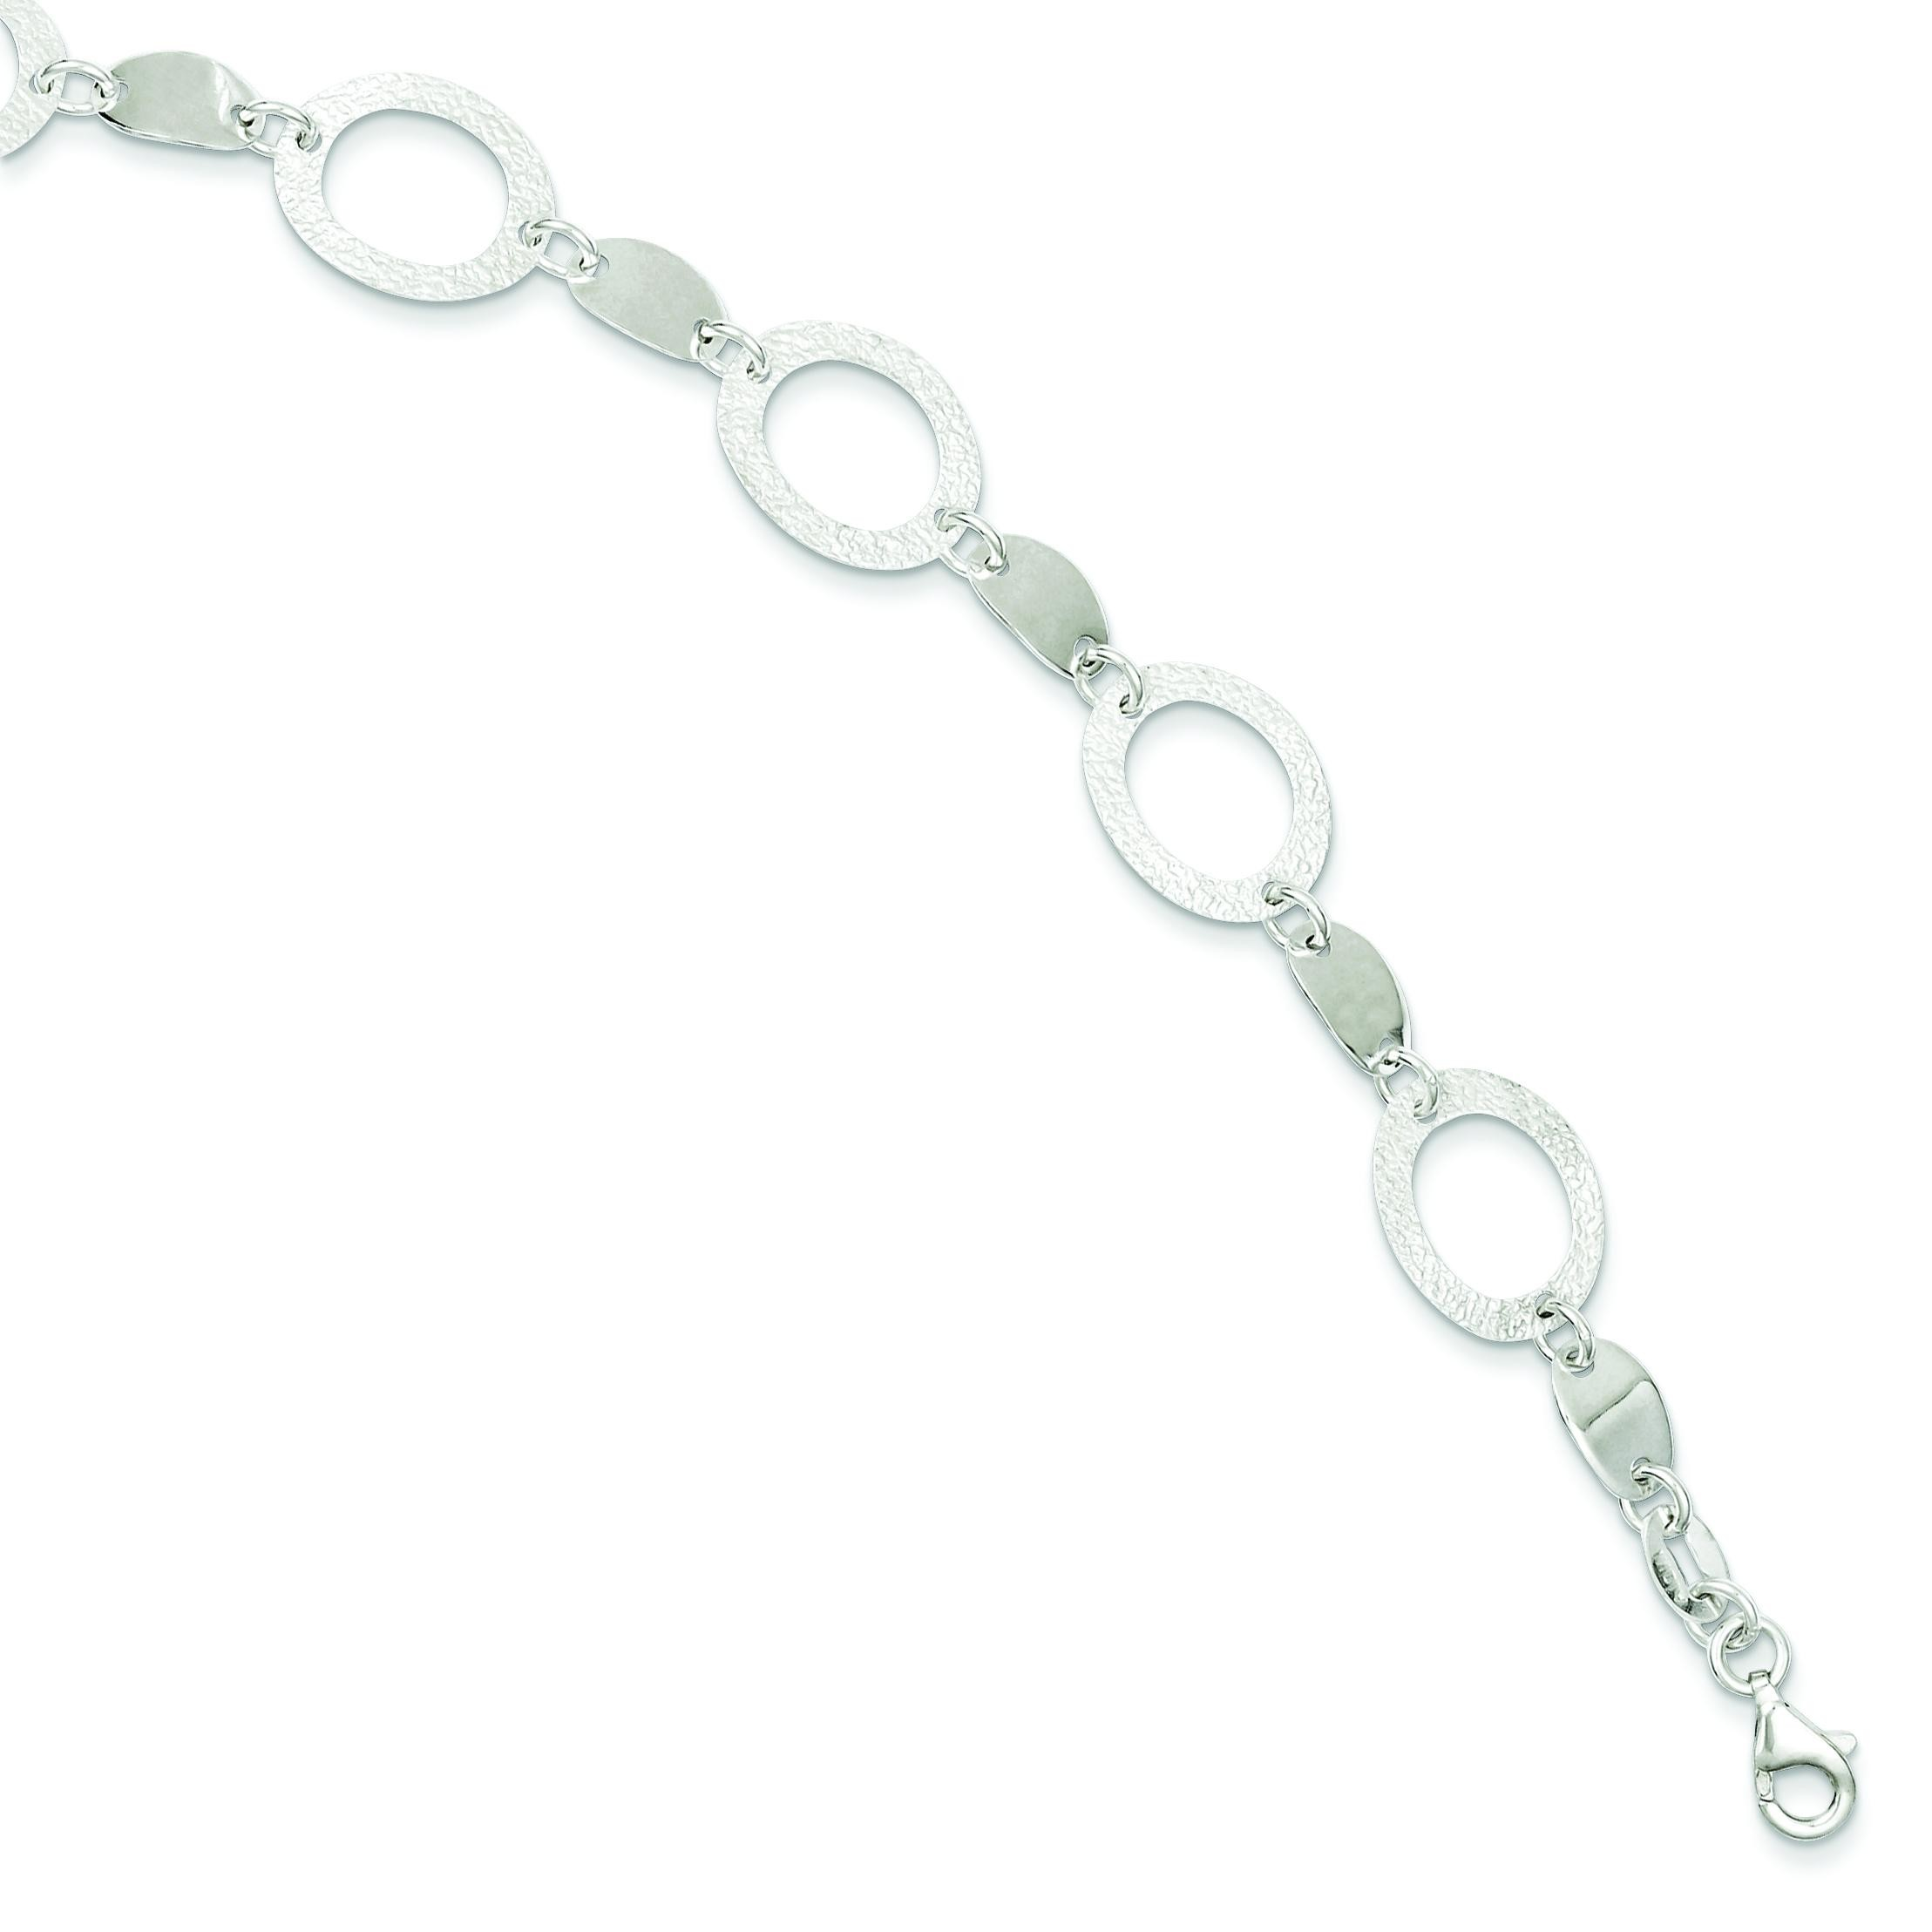 Polished Fancy Oval Link Bracelet in Sterling Silver